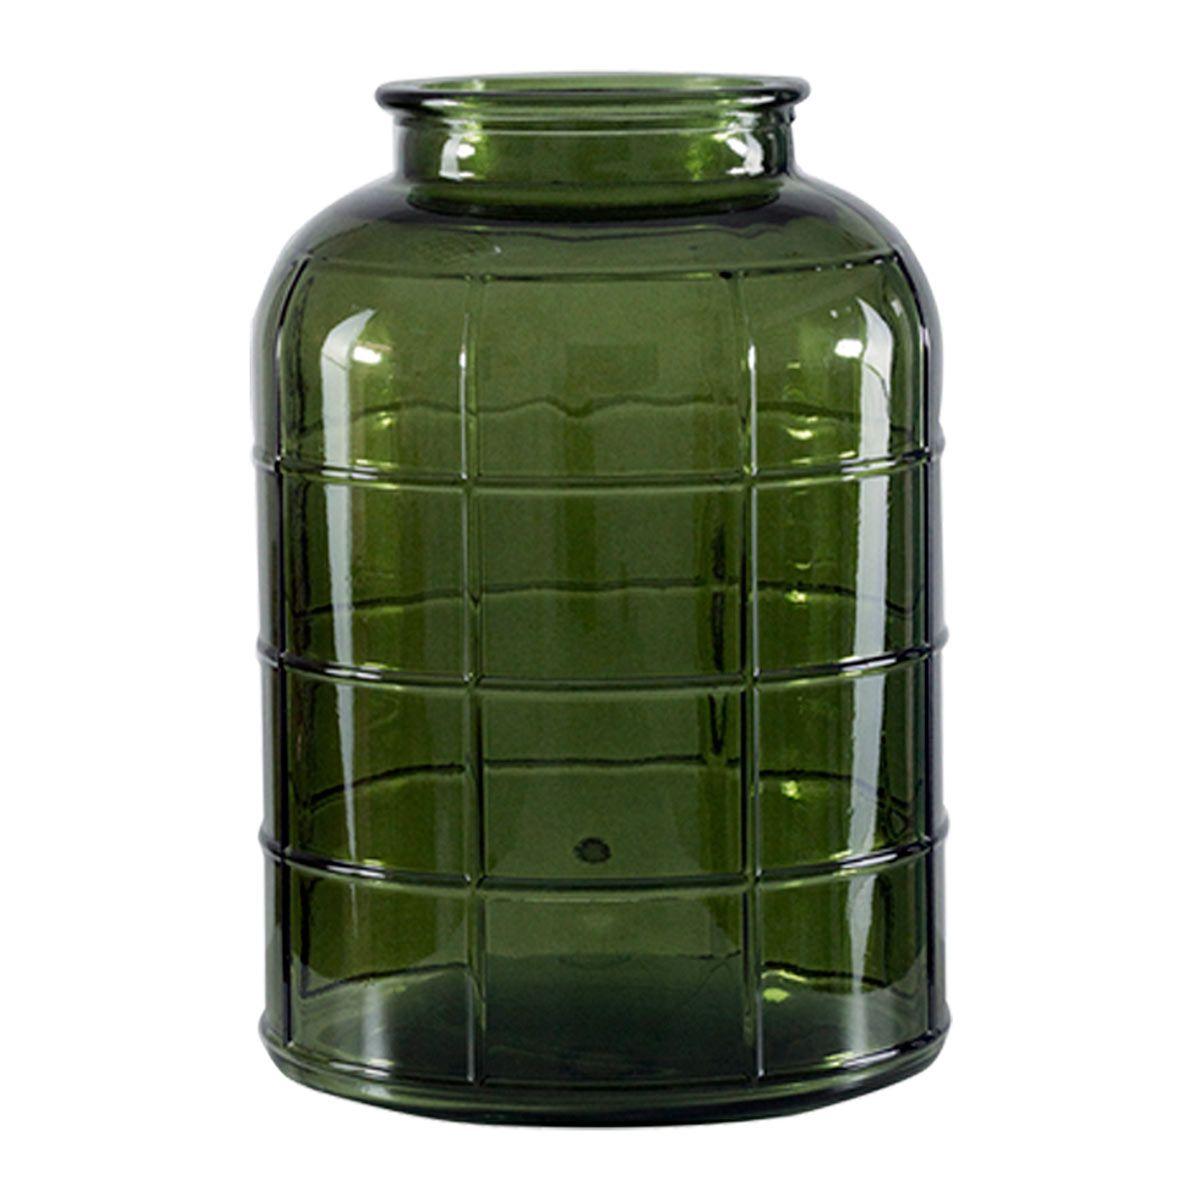 Vase bonbonne art déco vert